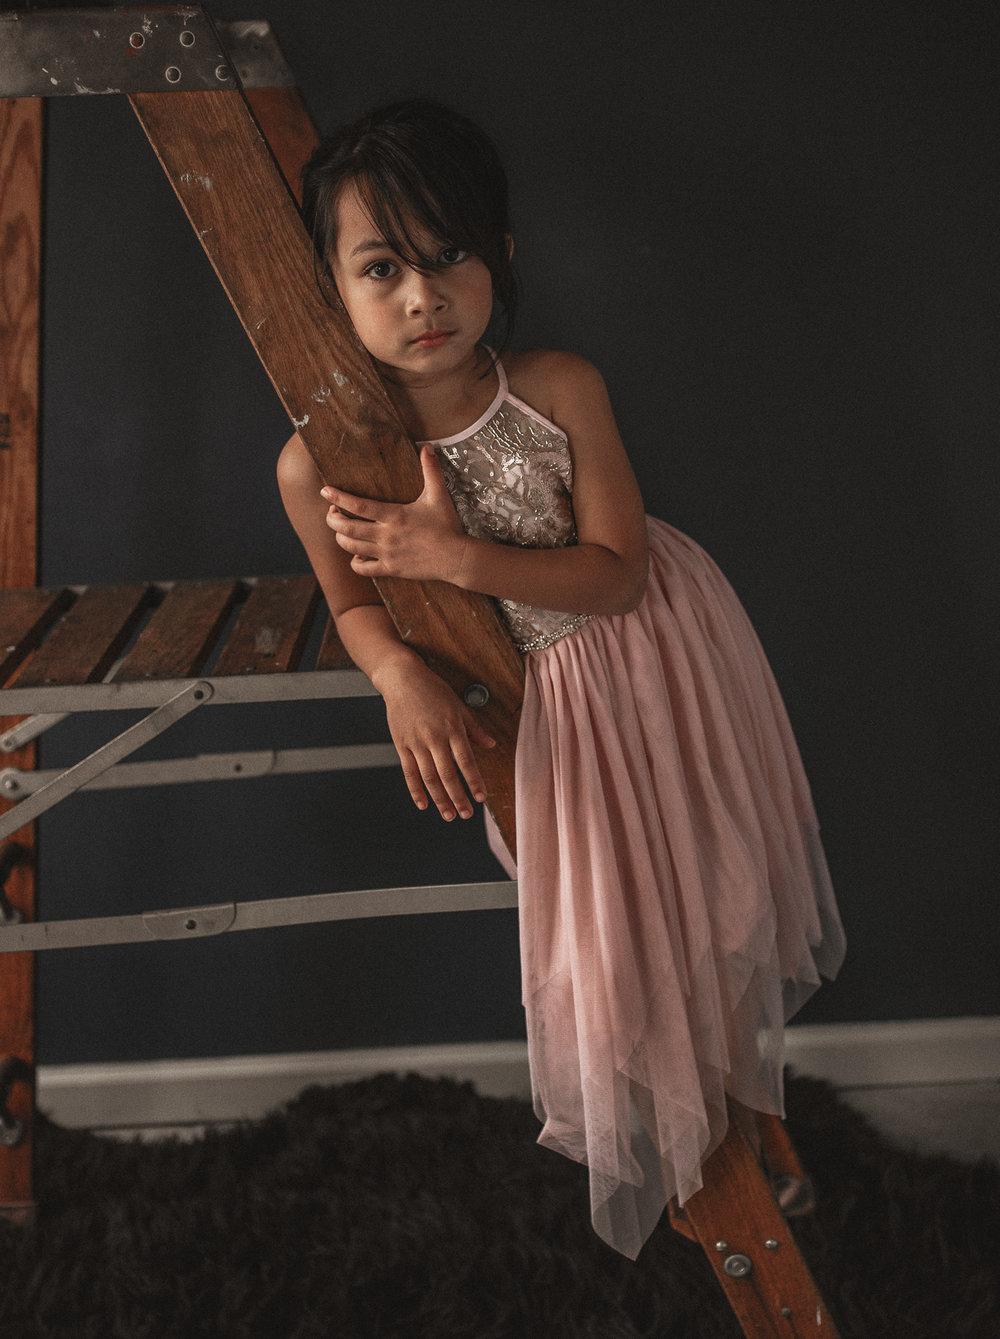 wallingford_children_portrait_photographer_16.jpg